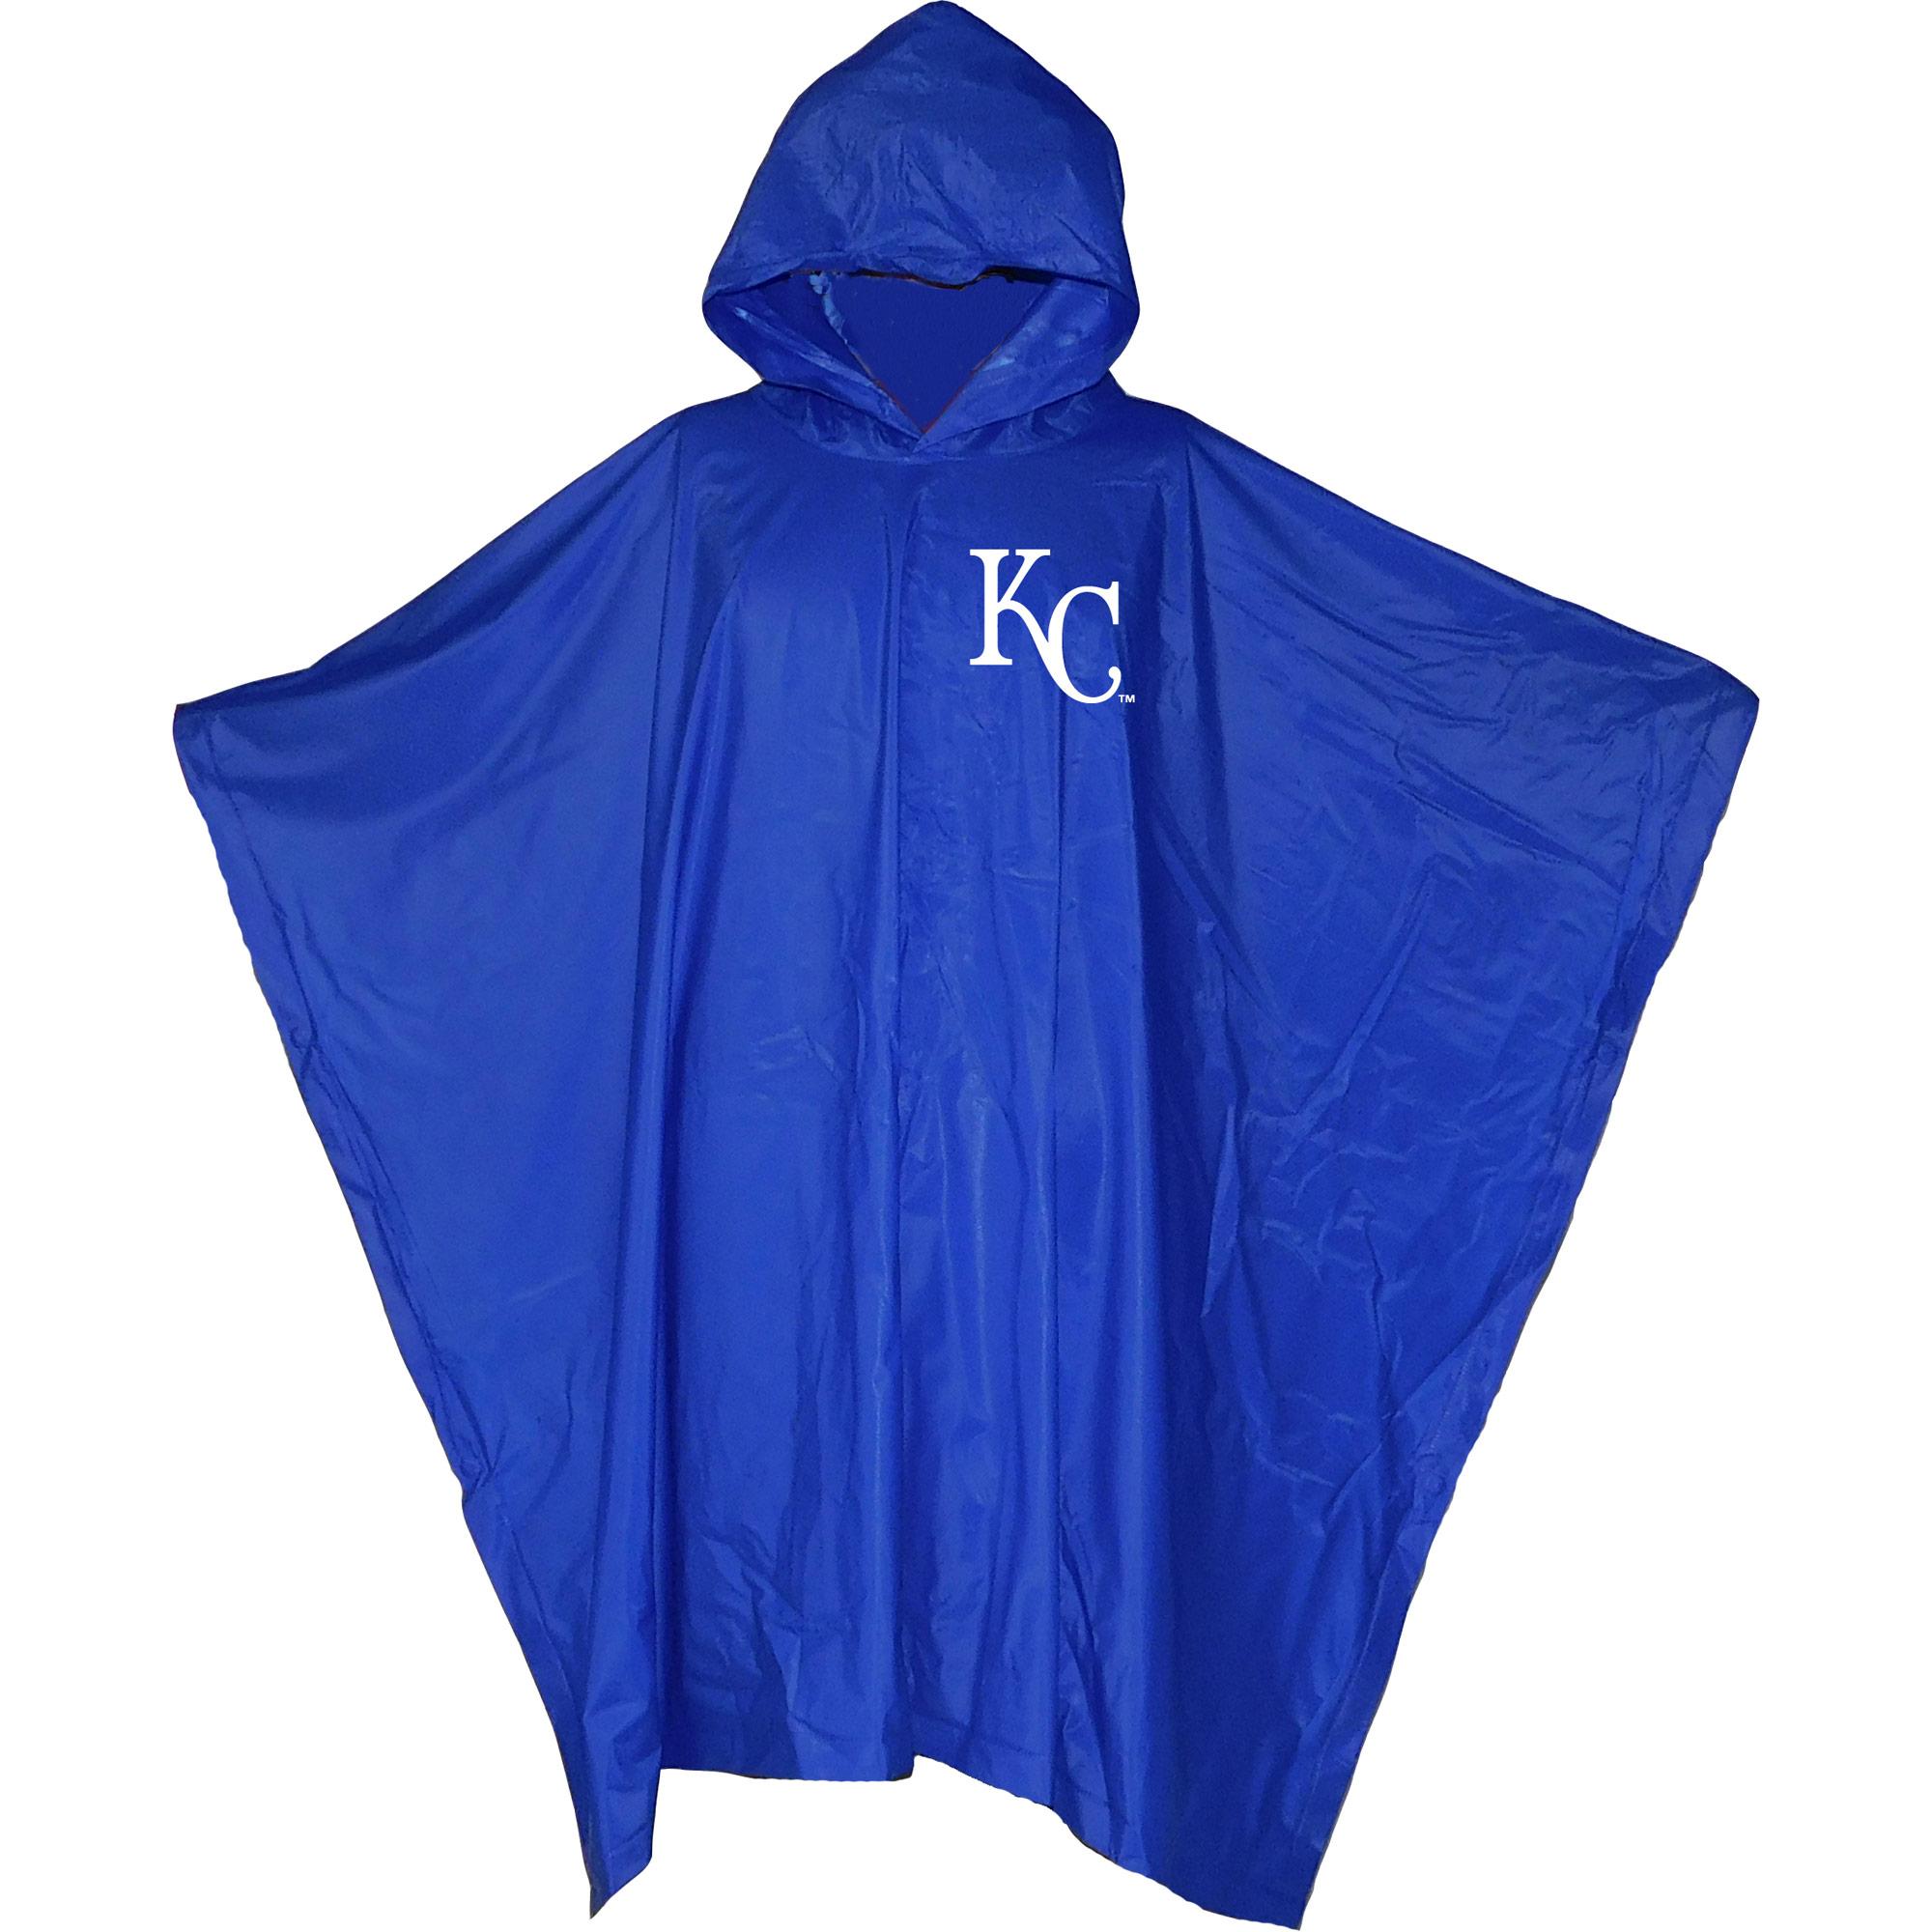 Kansas City Royals Stadium Poncho No Size by Storm Duds